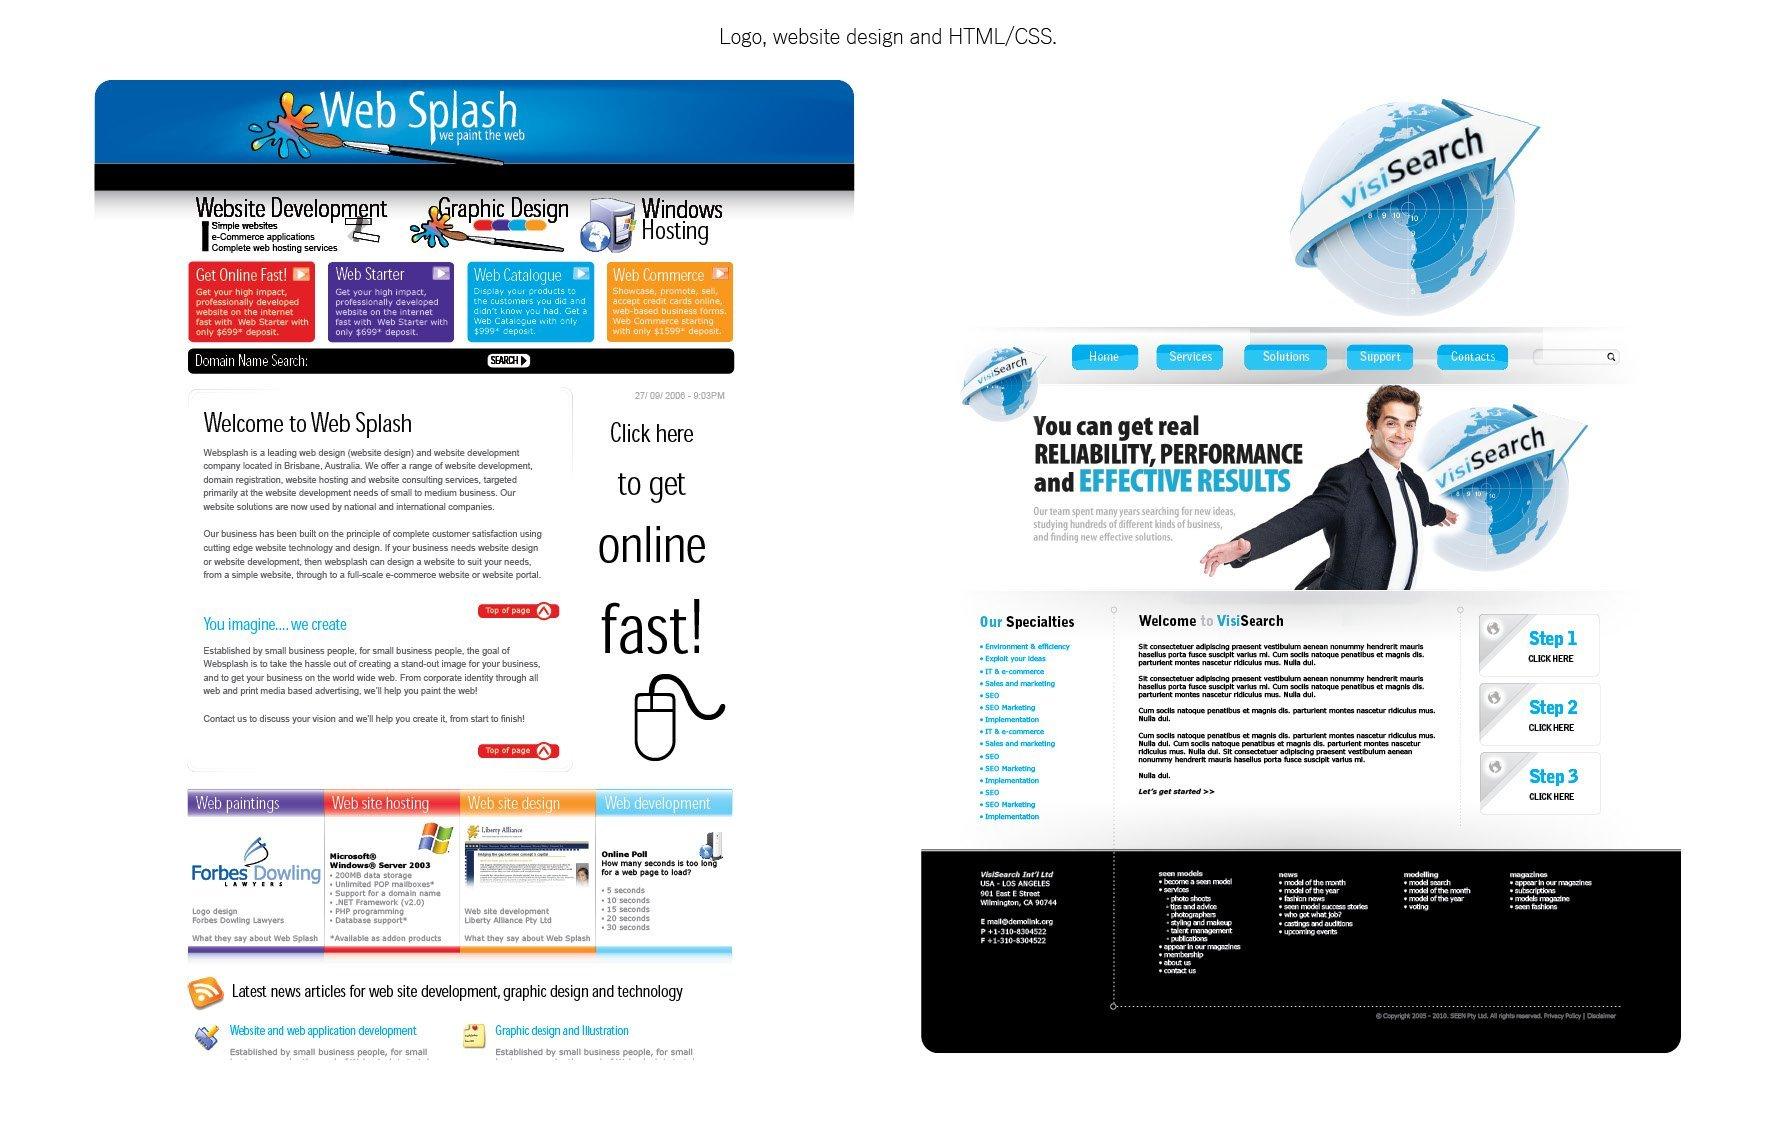 Portfolio - time at Web Splash